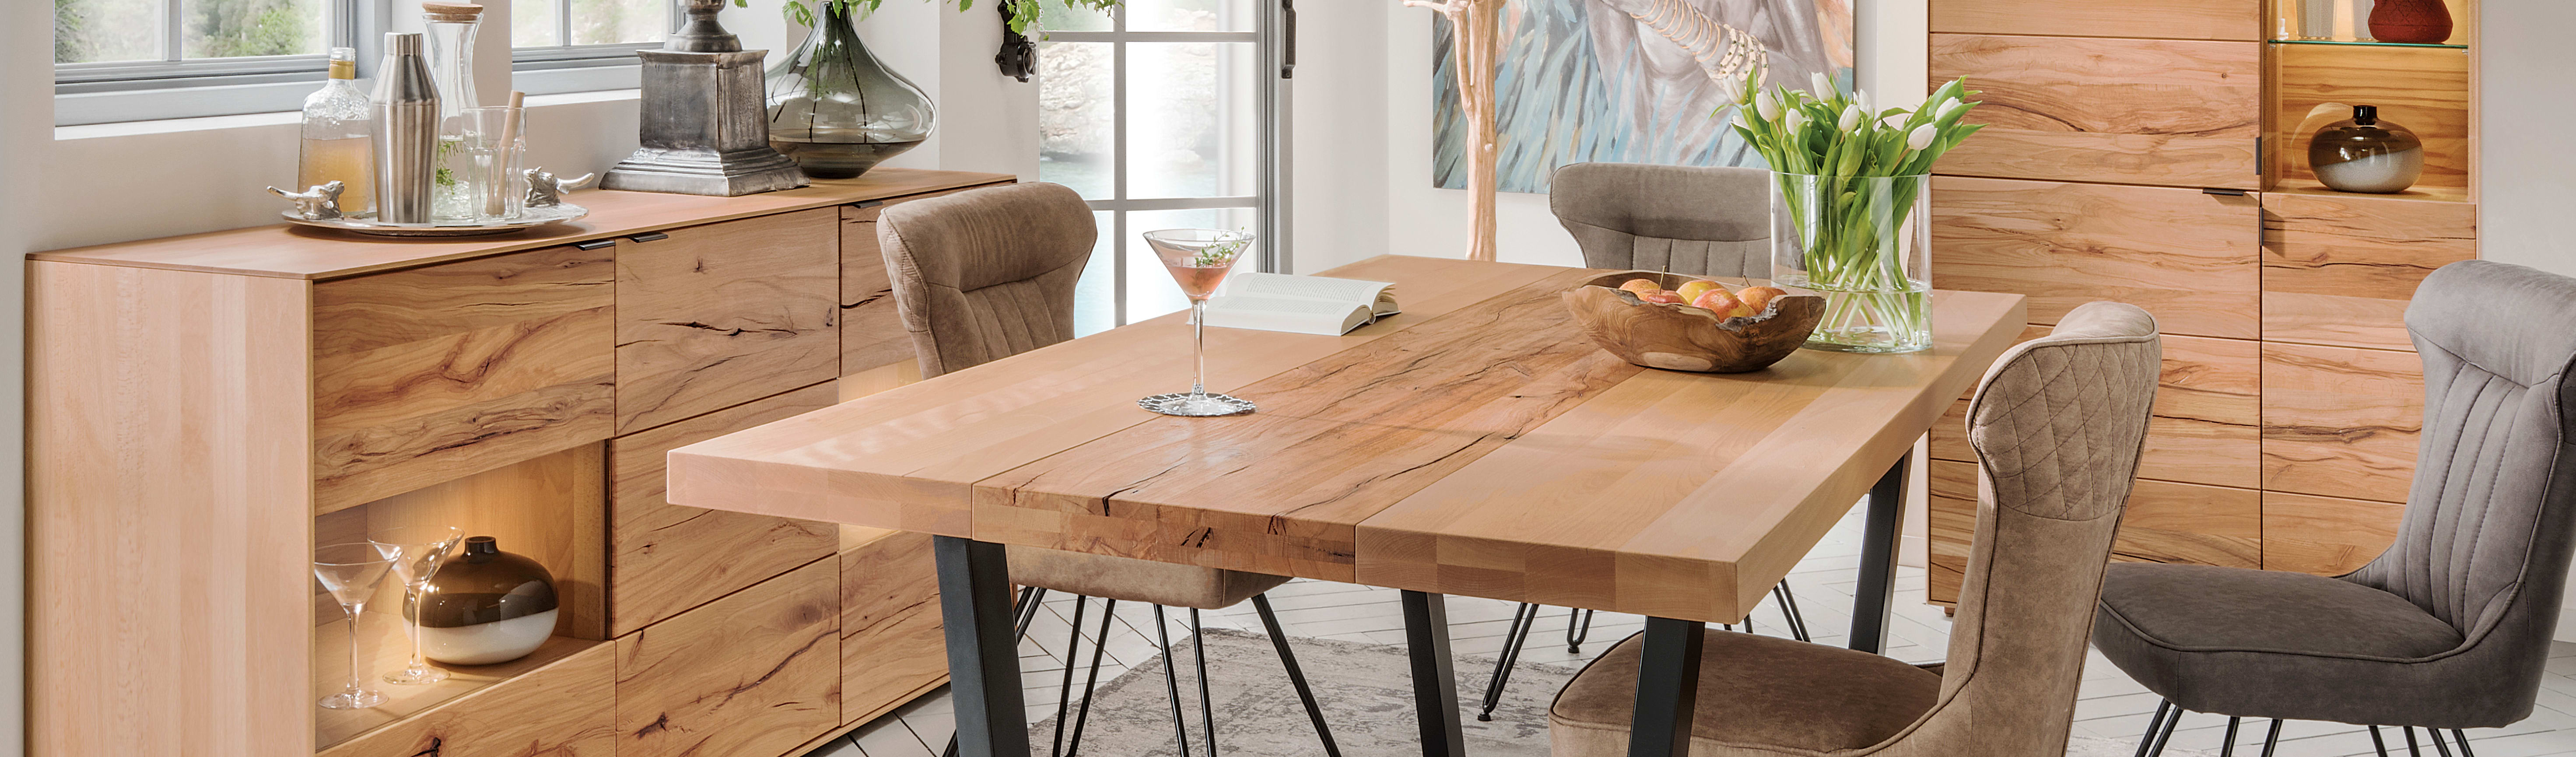 allnatura online shops in heubach homify. Black Bedroom Furniture Sets. Home Design Ideas